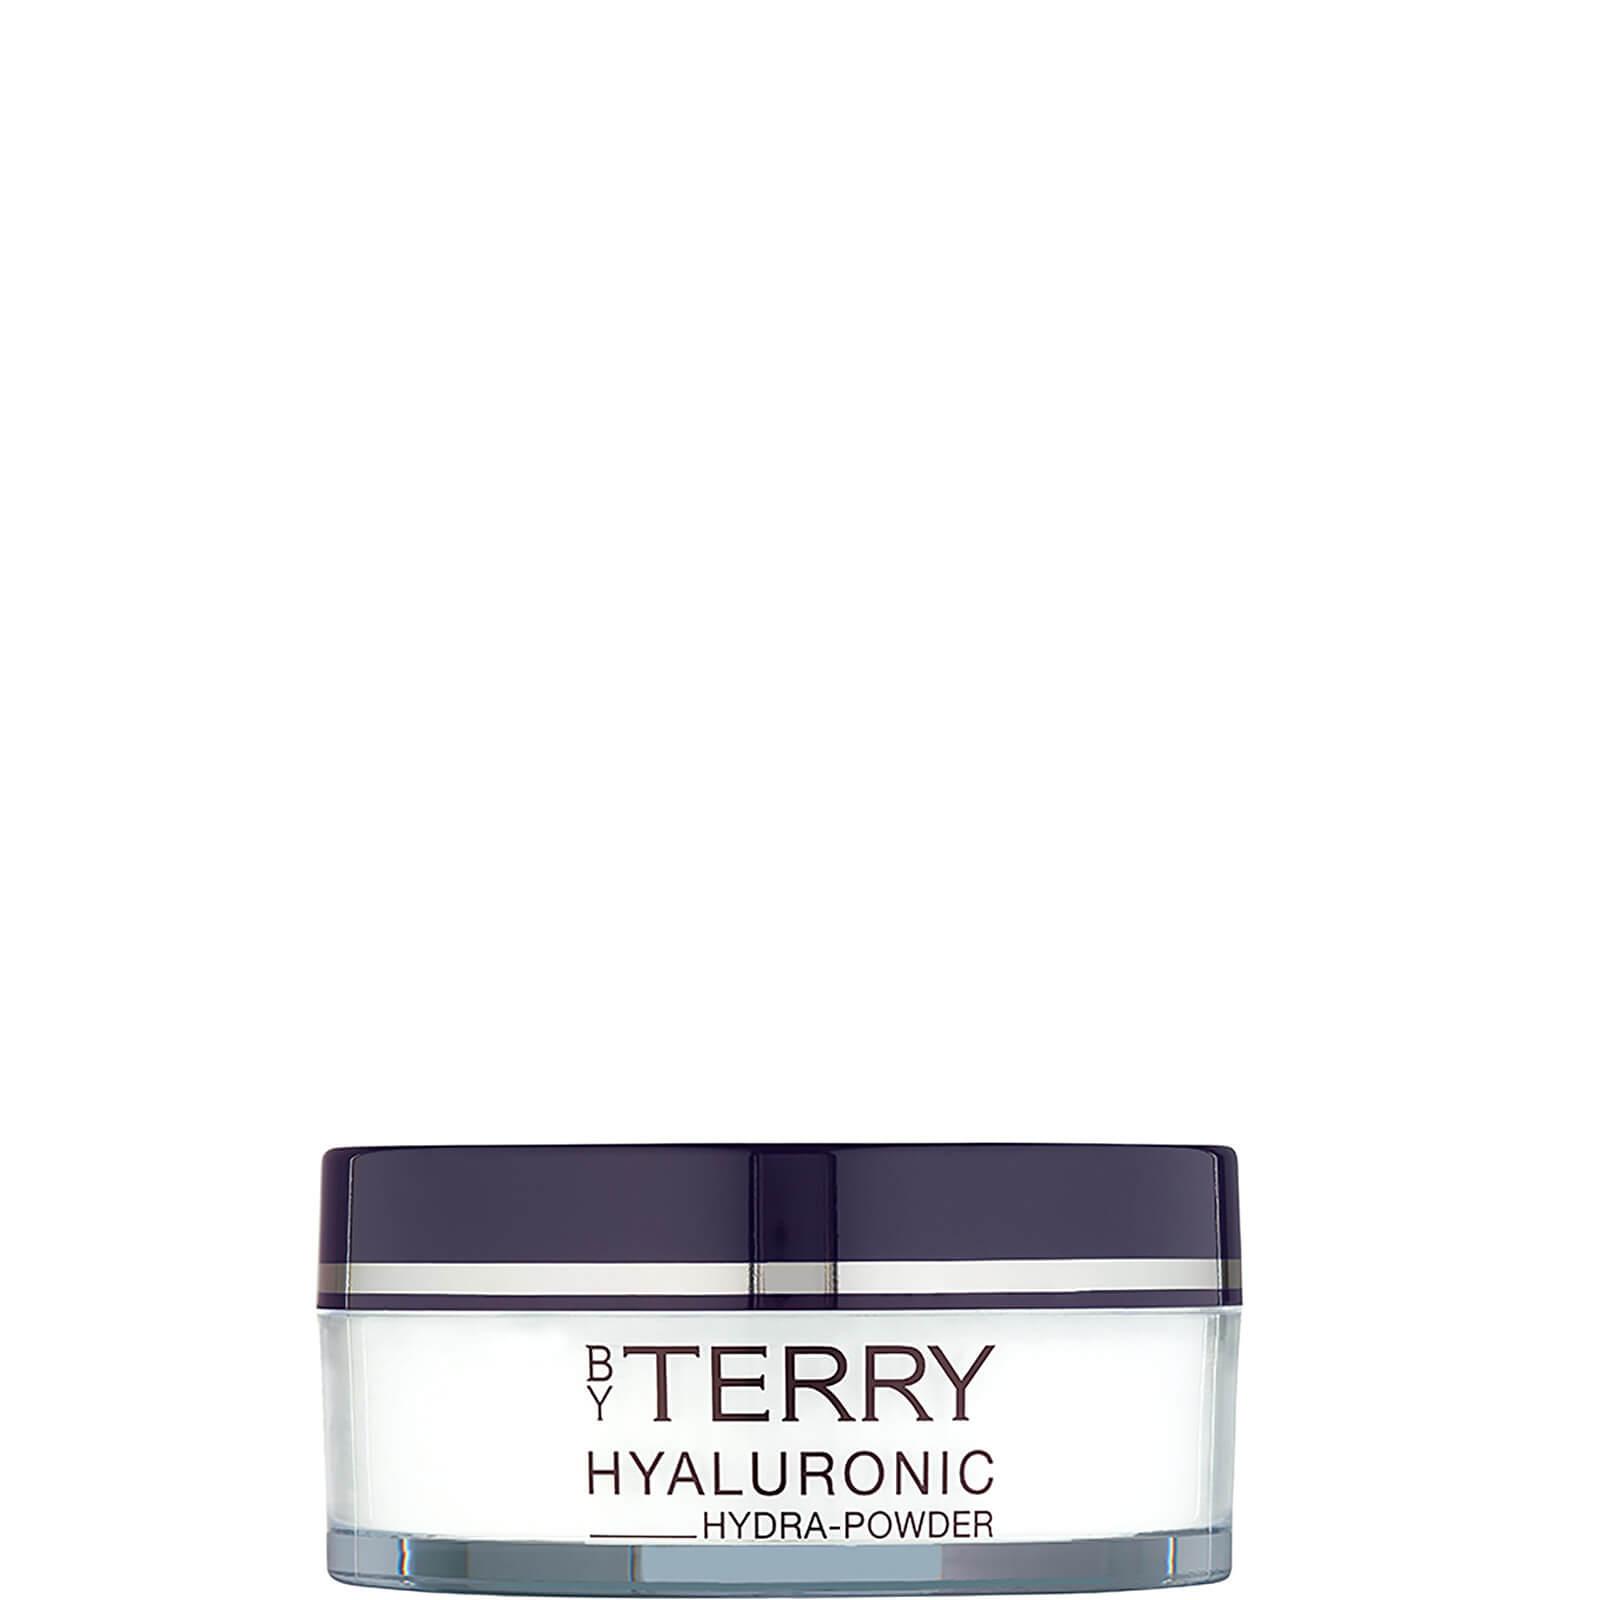 Купить Увлажняющая пудра с гиалуроновой кислотой By Terry Hyaluronic Hydra-Powder 10 мл